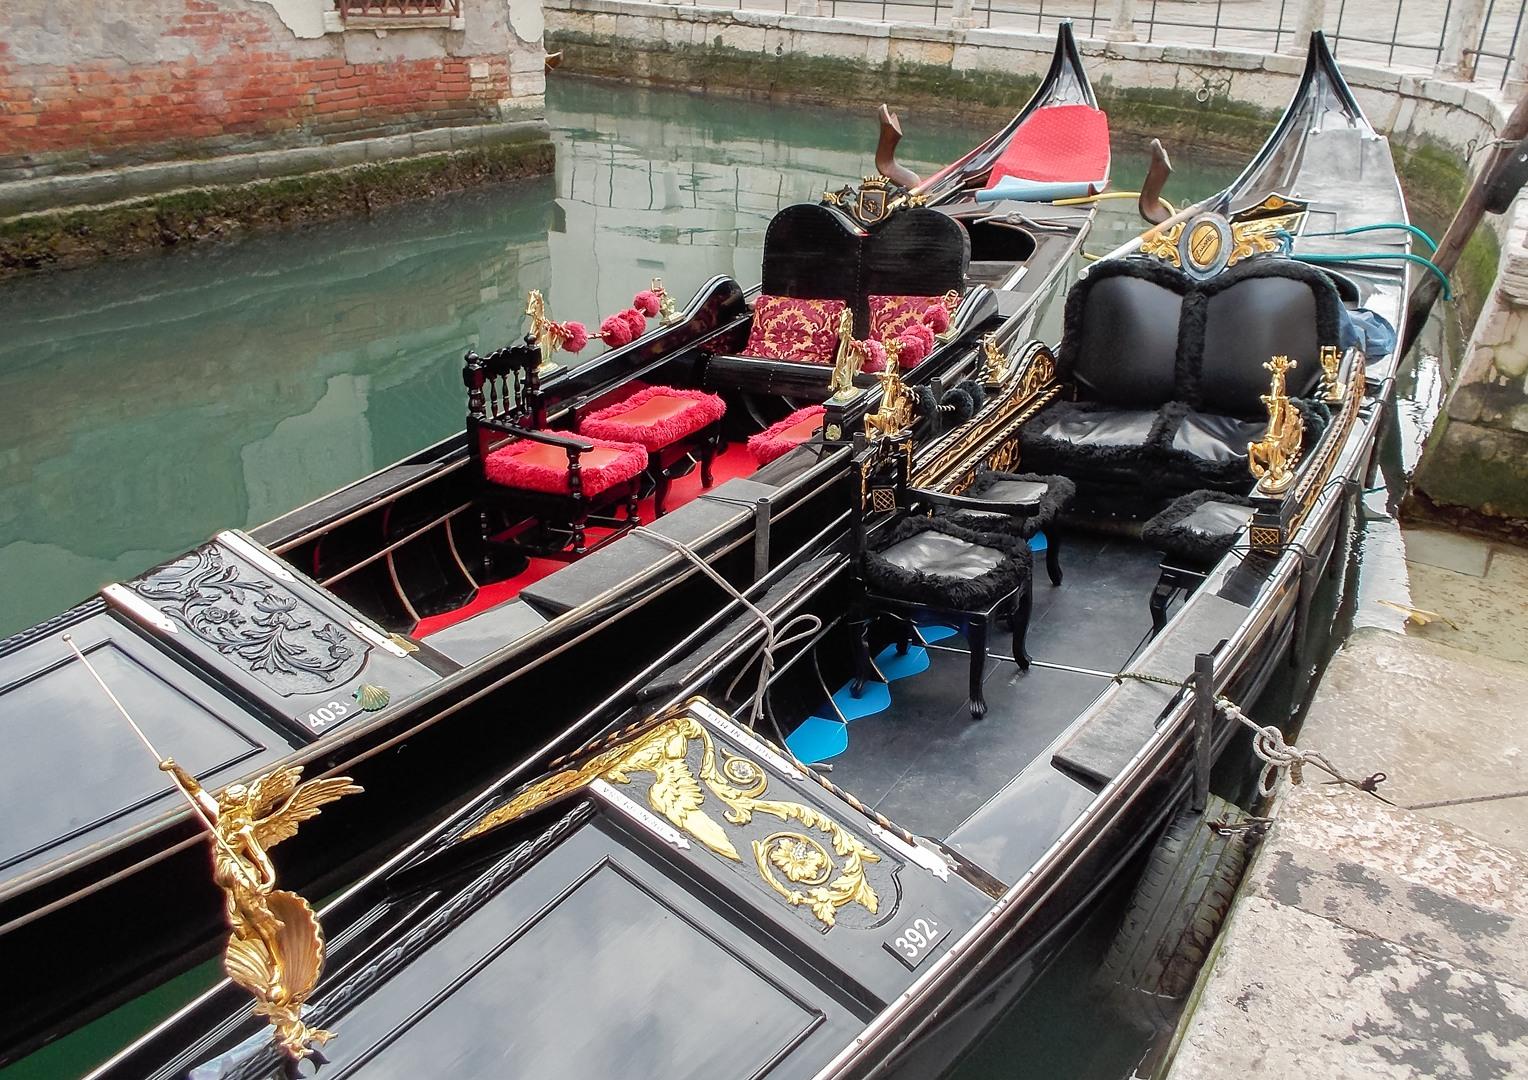 Гондола, Венеция, Италия